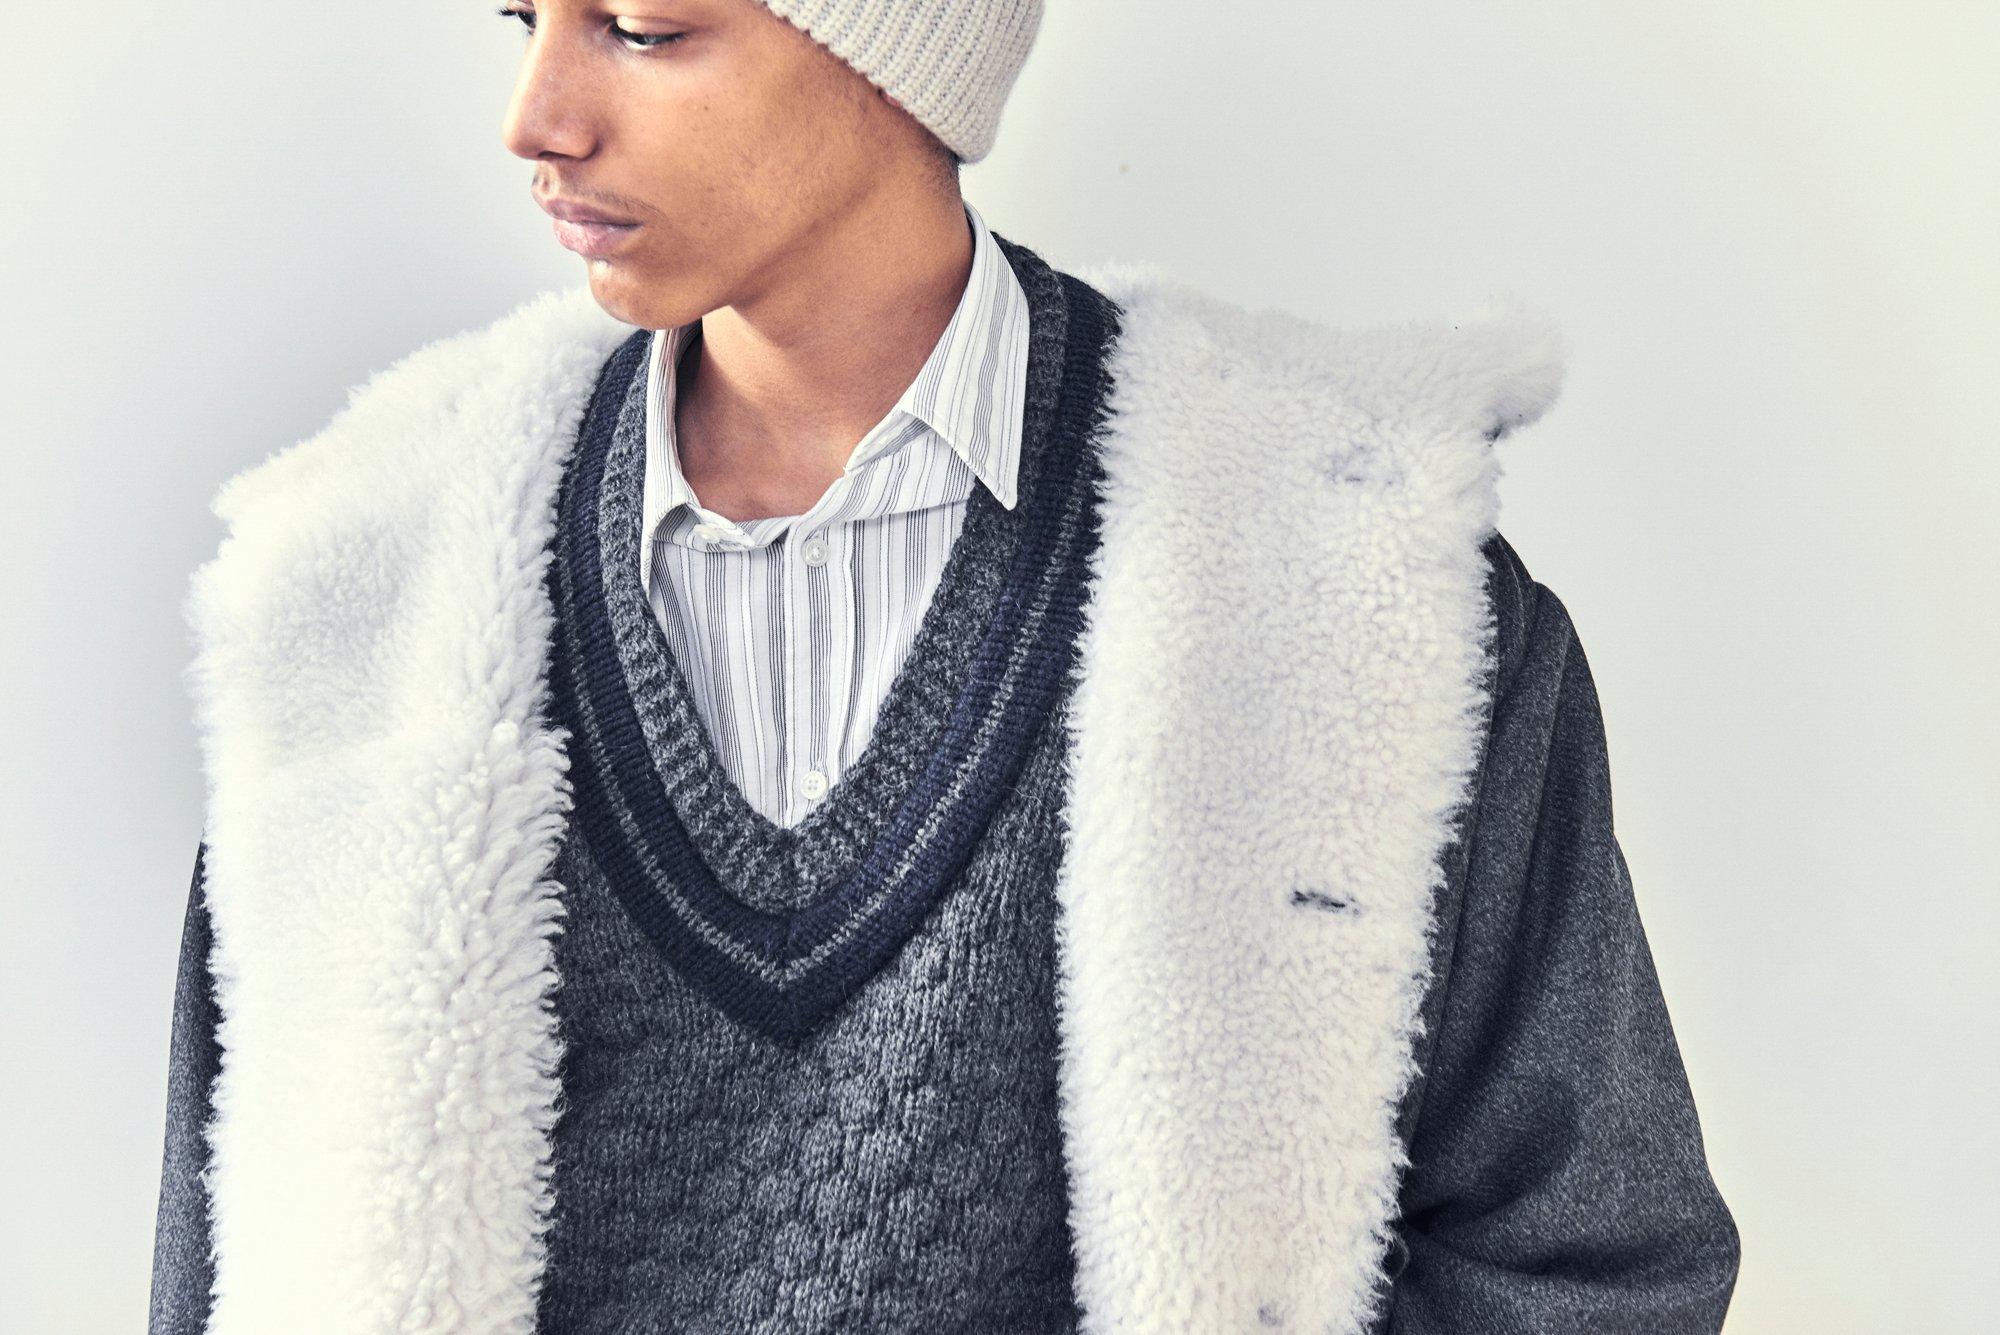 BOSS 2018 秋冬男装纽约时装秀